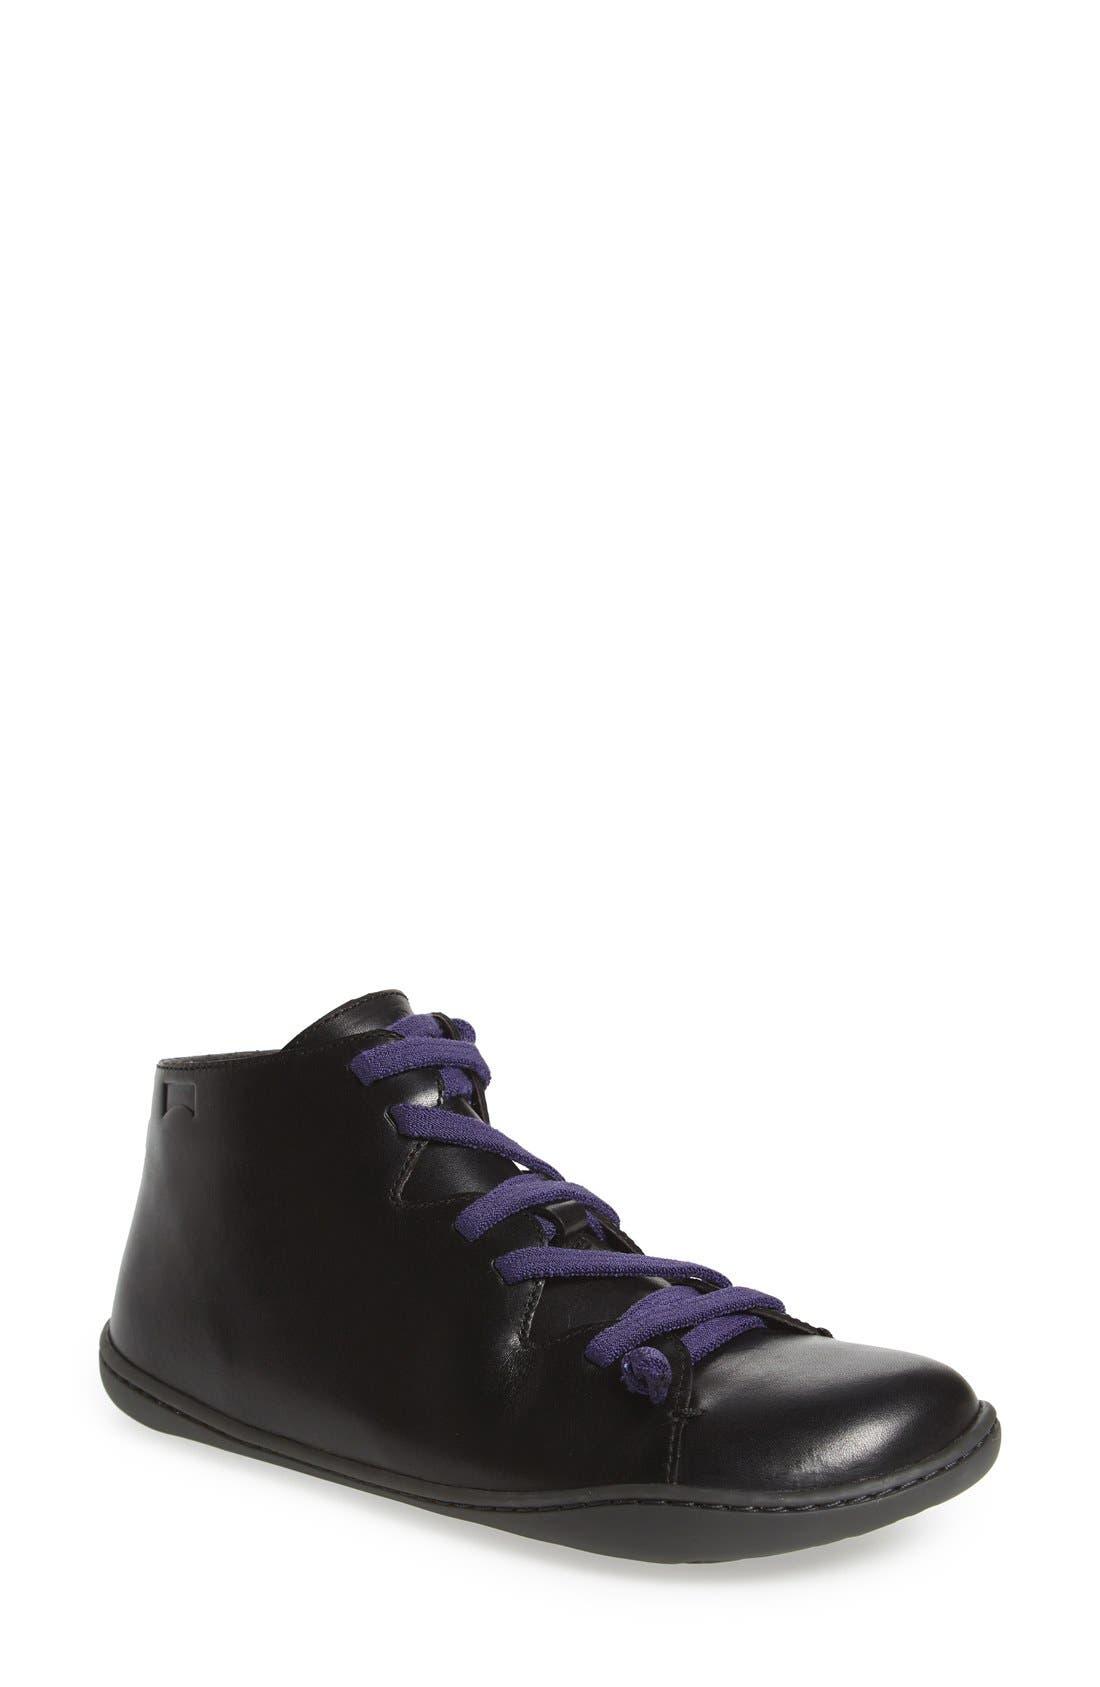 'Peu Cami' Mid Sneaker,                             Main thumbnail 1, color,                             BLACK LEATHER